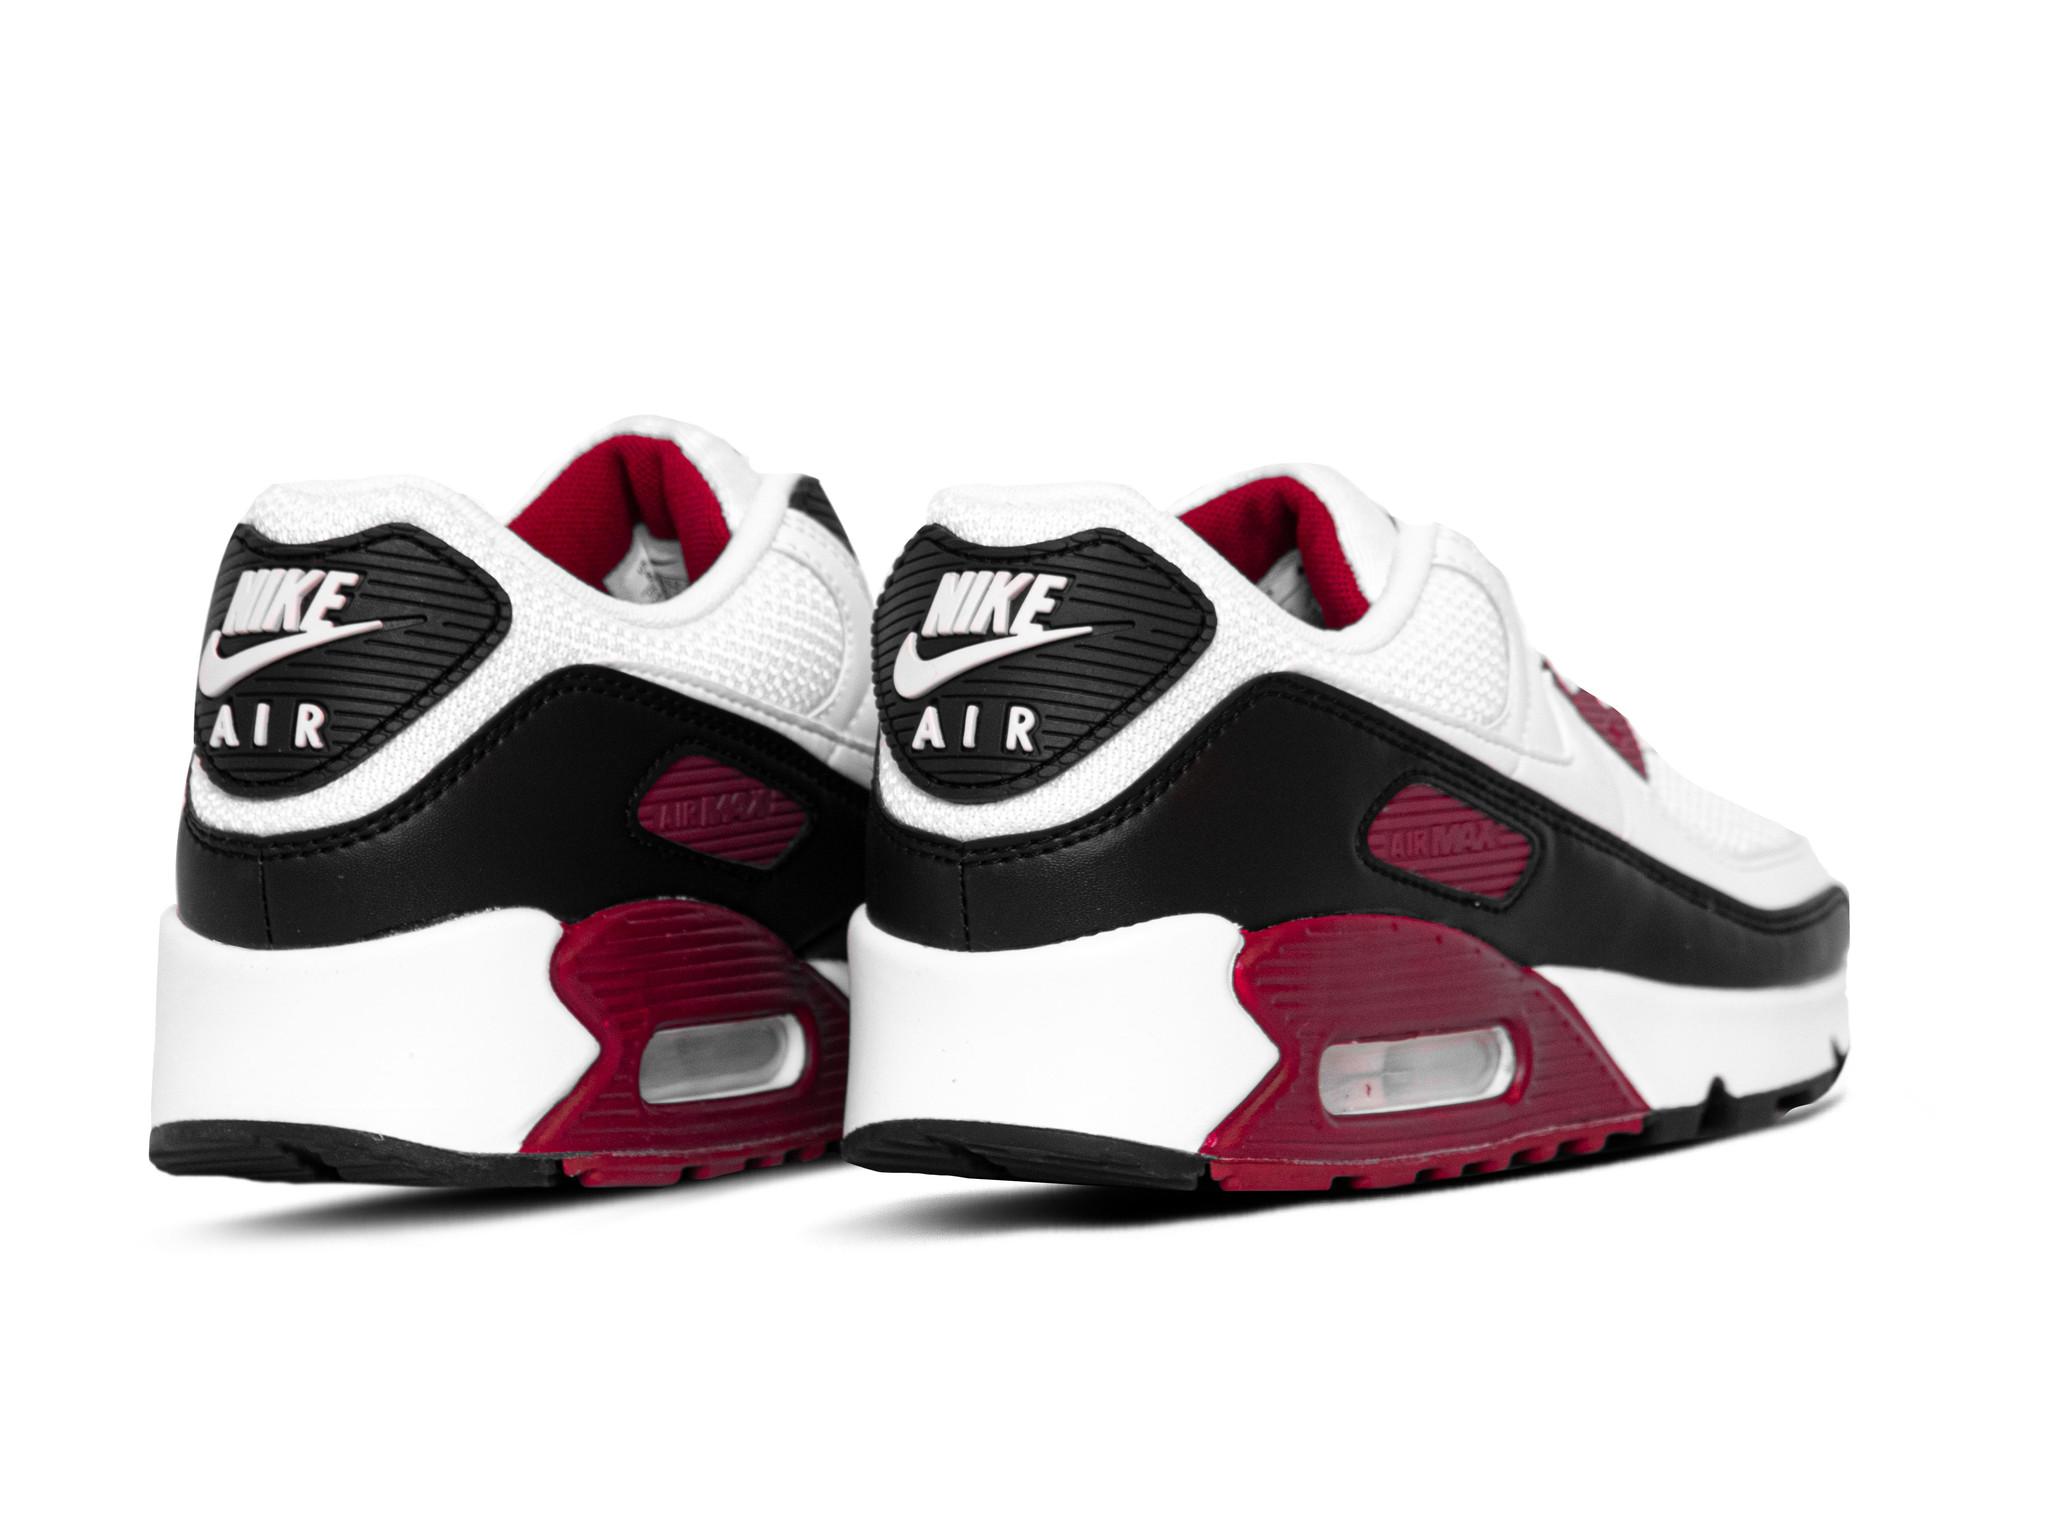 Nike Air Max 90 White New Maroon Black